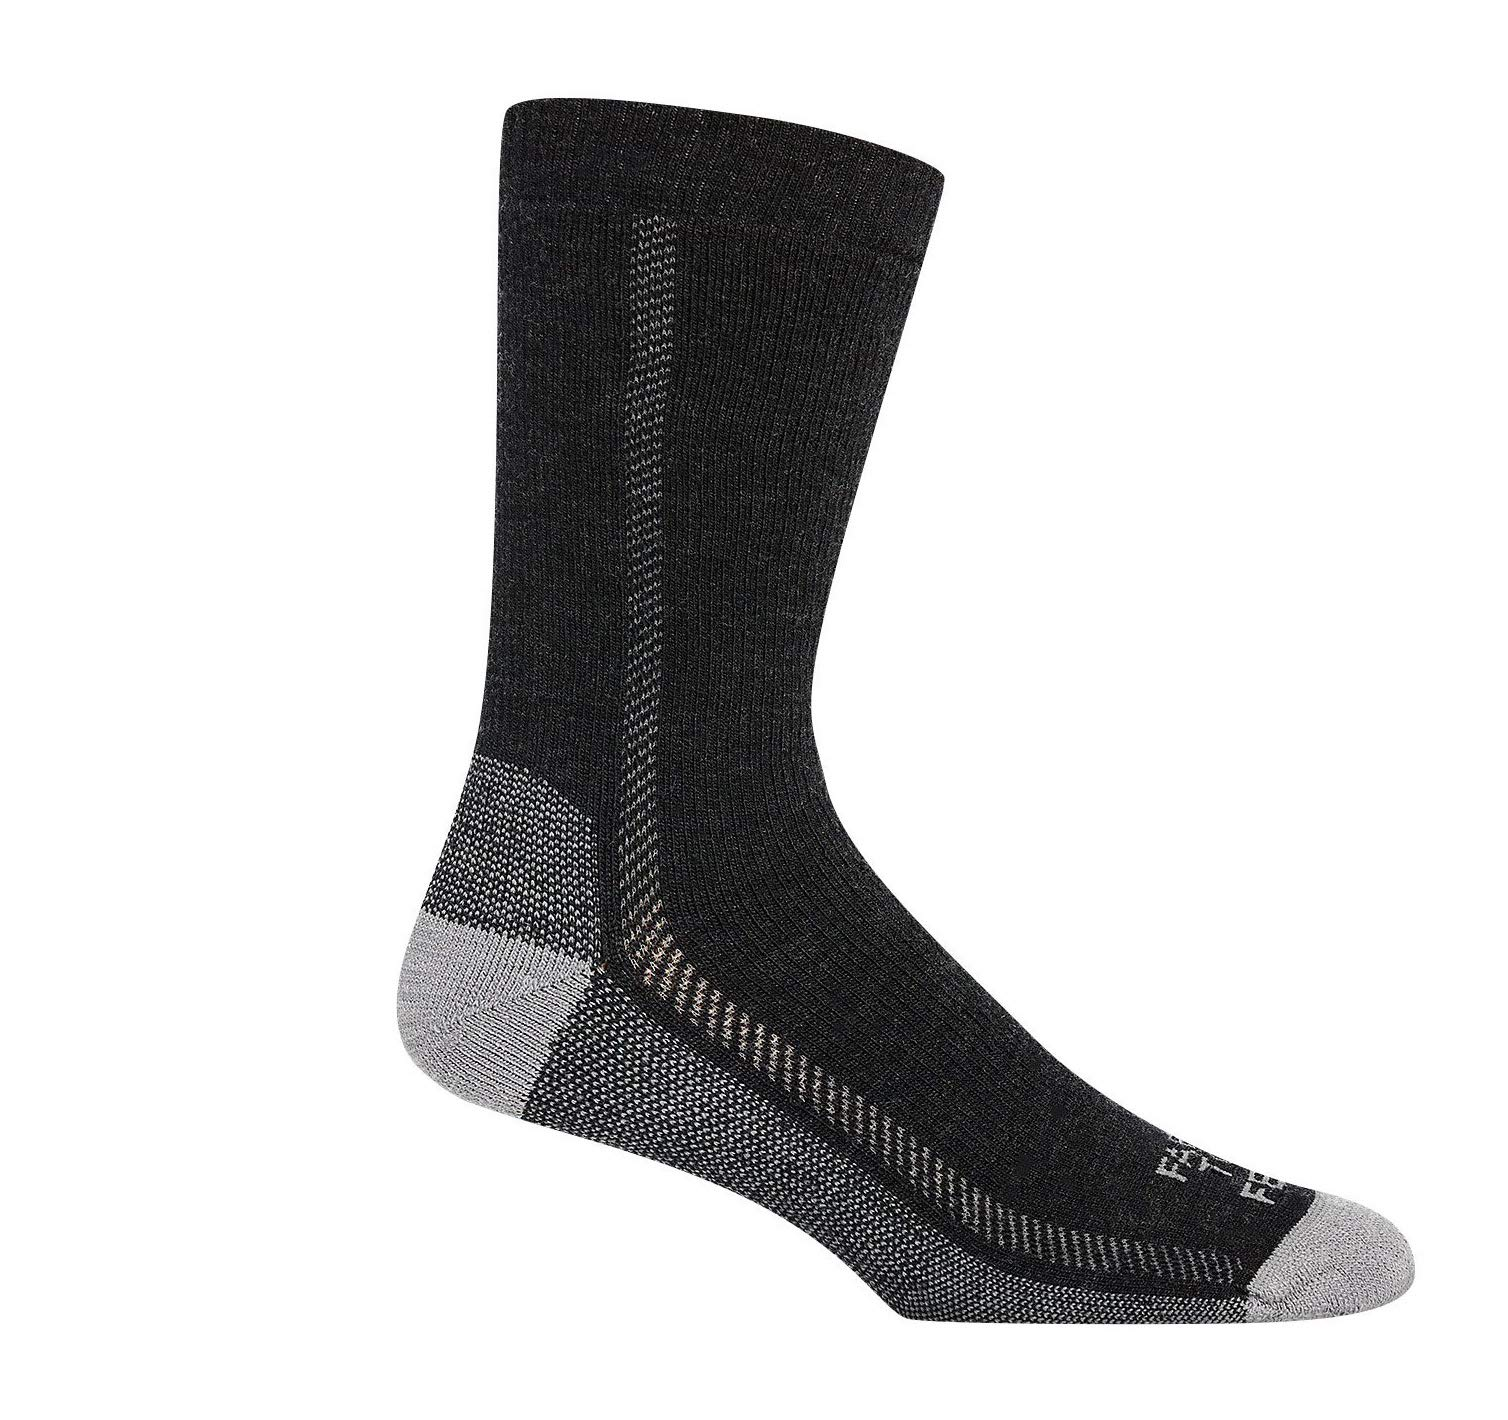 Farm to Feet Madison Lightweight Hiking Crew Socks, Charcoal/Platinum, Large by Farm to Feet